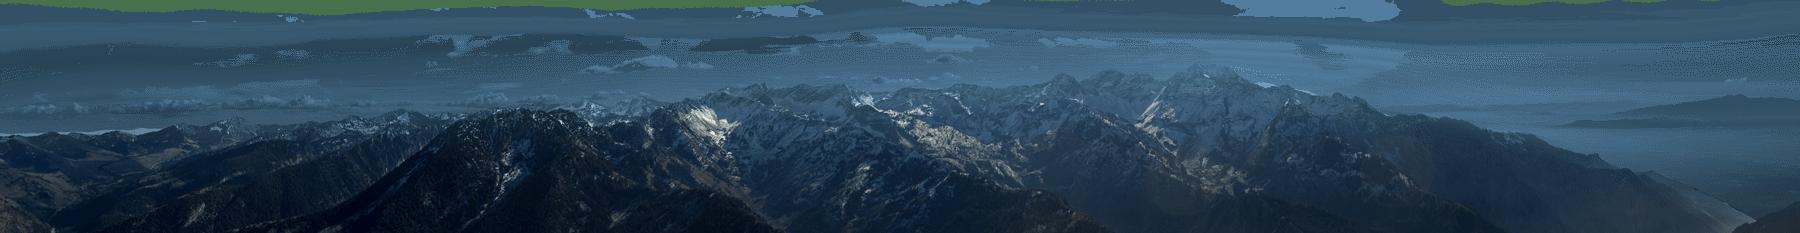 Wasatch mountains min